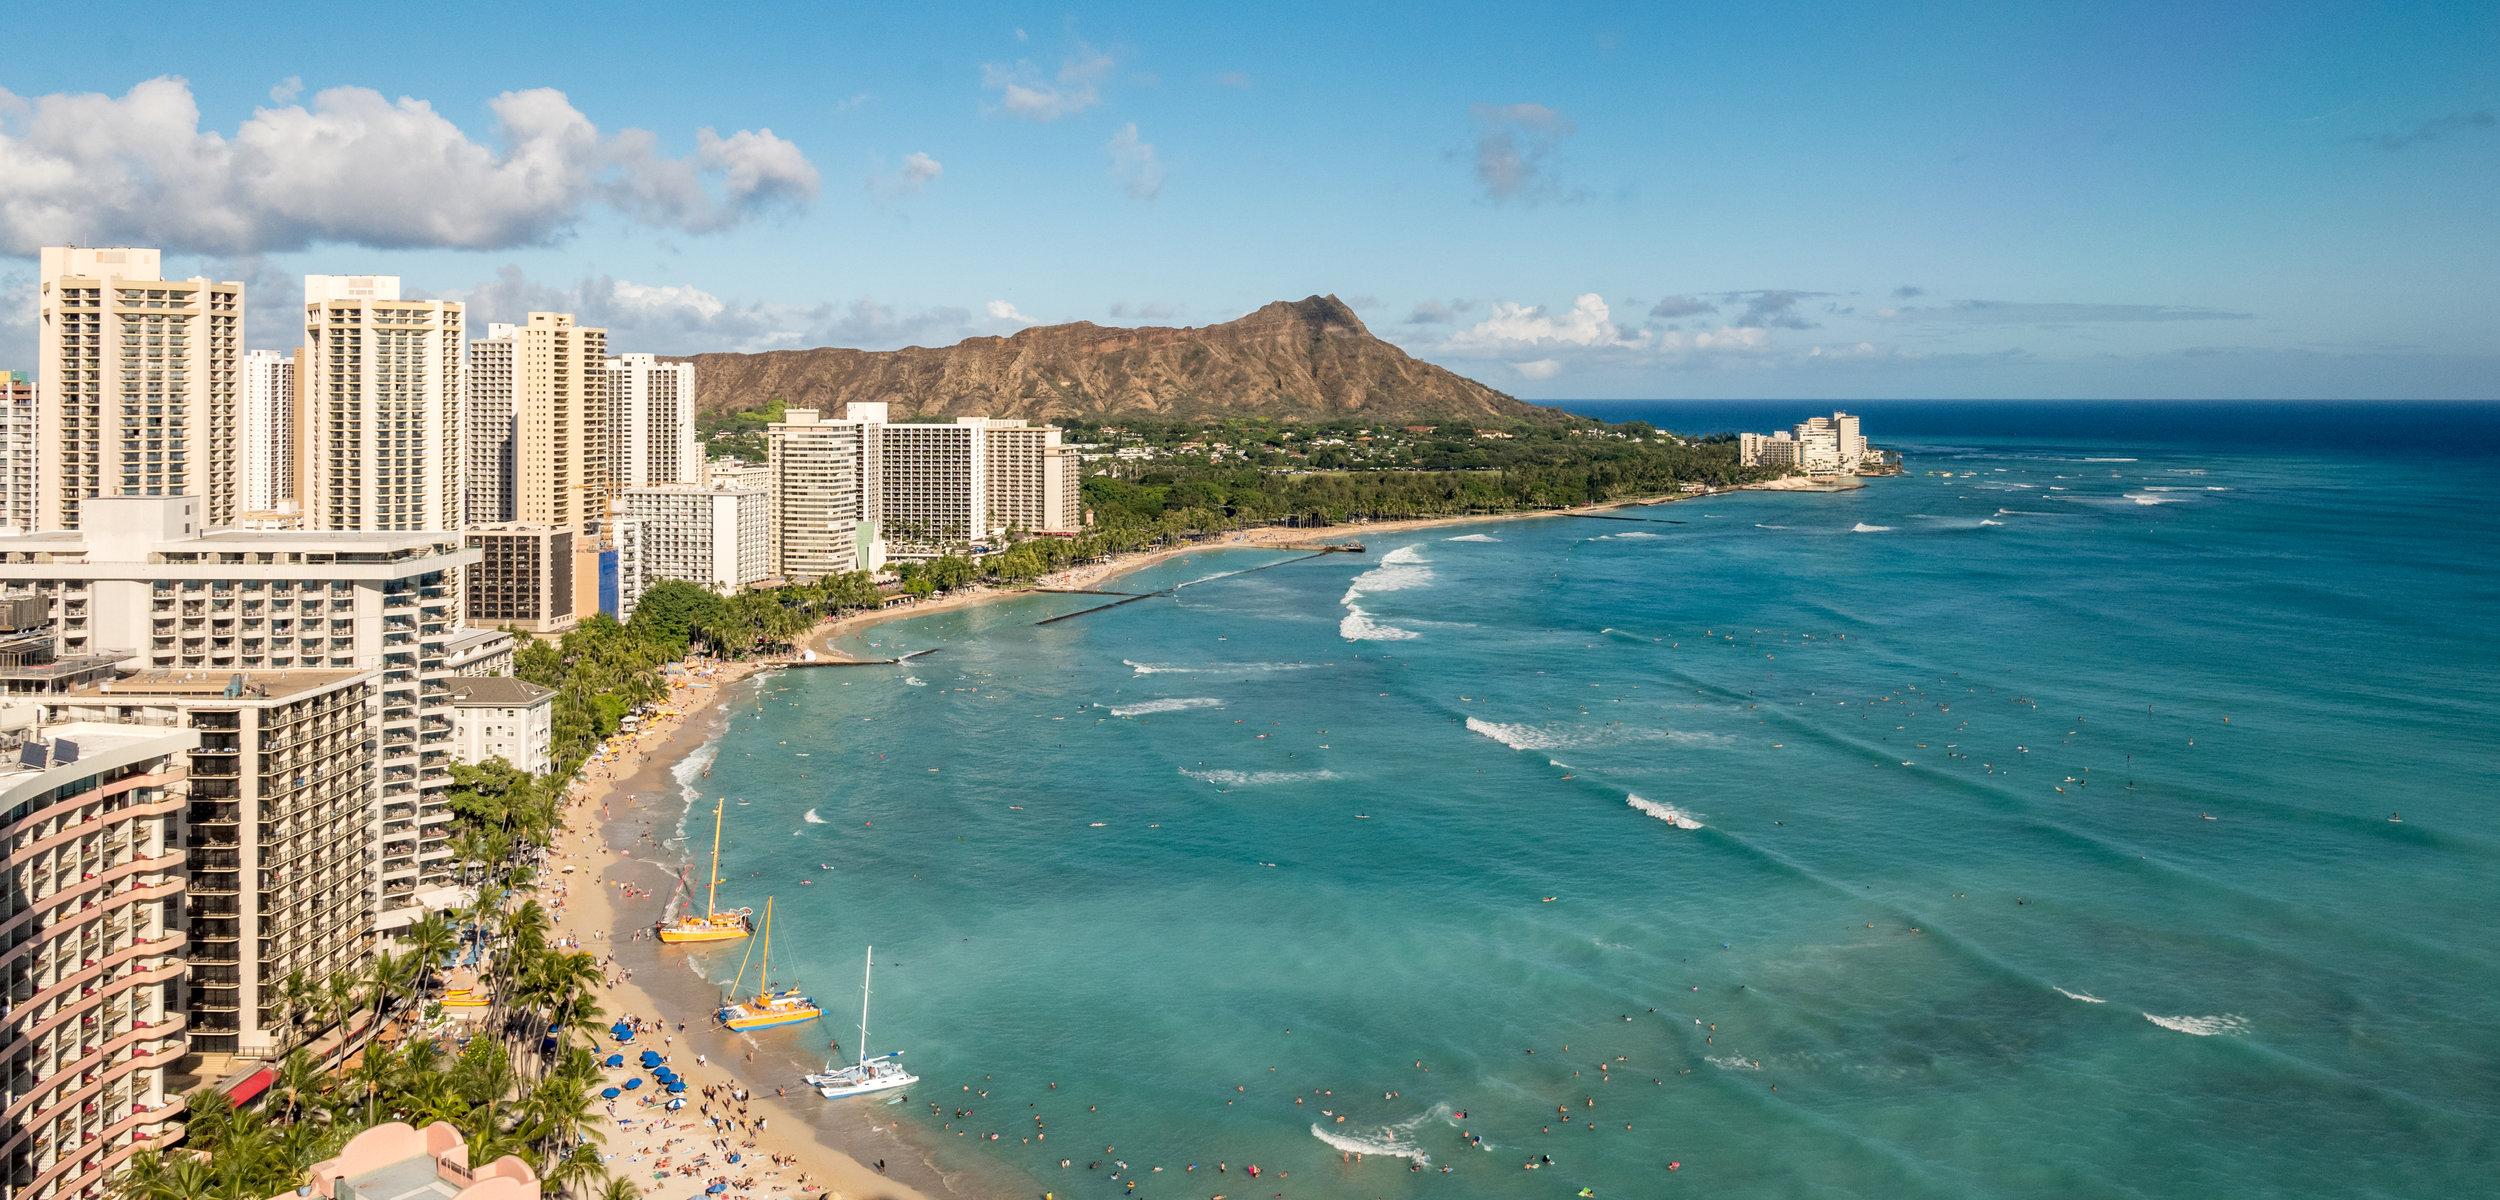 Waikiki Beach, Honolulu, Oahu and Diamond Head